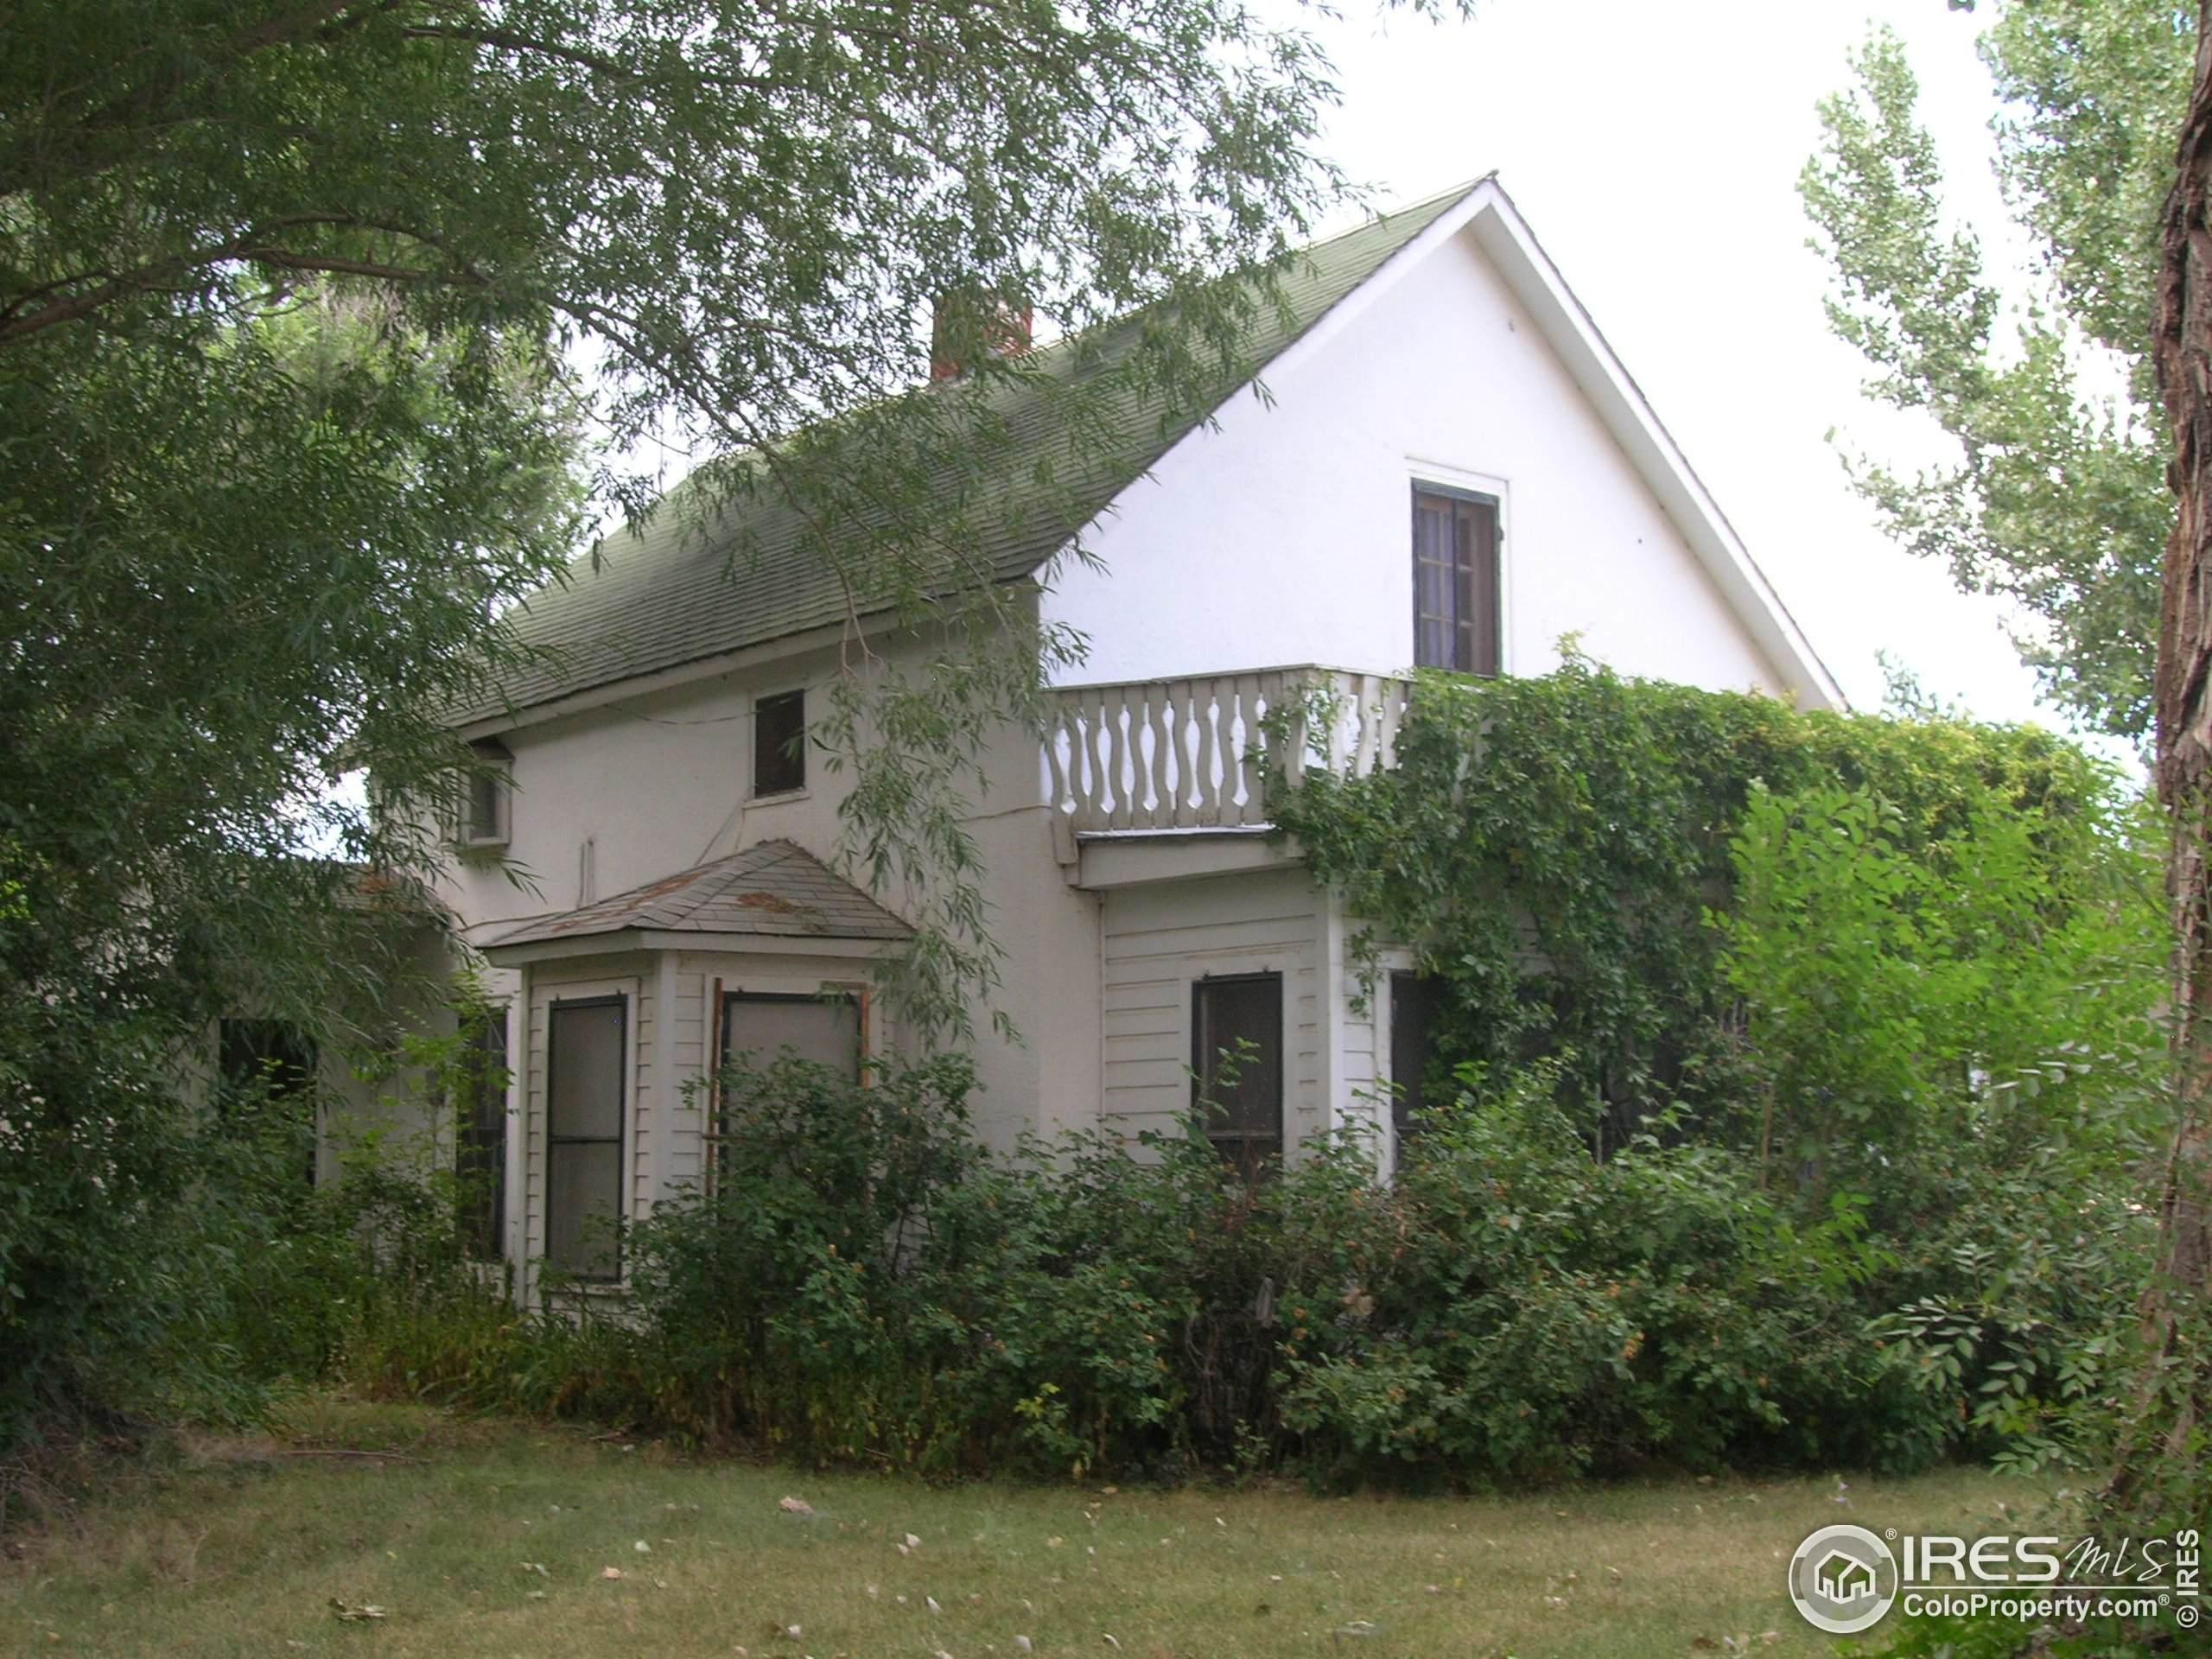 51 W Ranch Rd, Wiggins, CO 80654 (MLS #934846) :: The Sam Biller Home Team